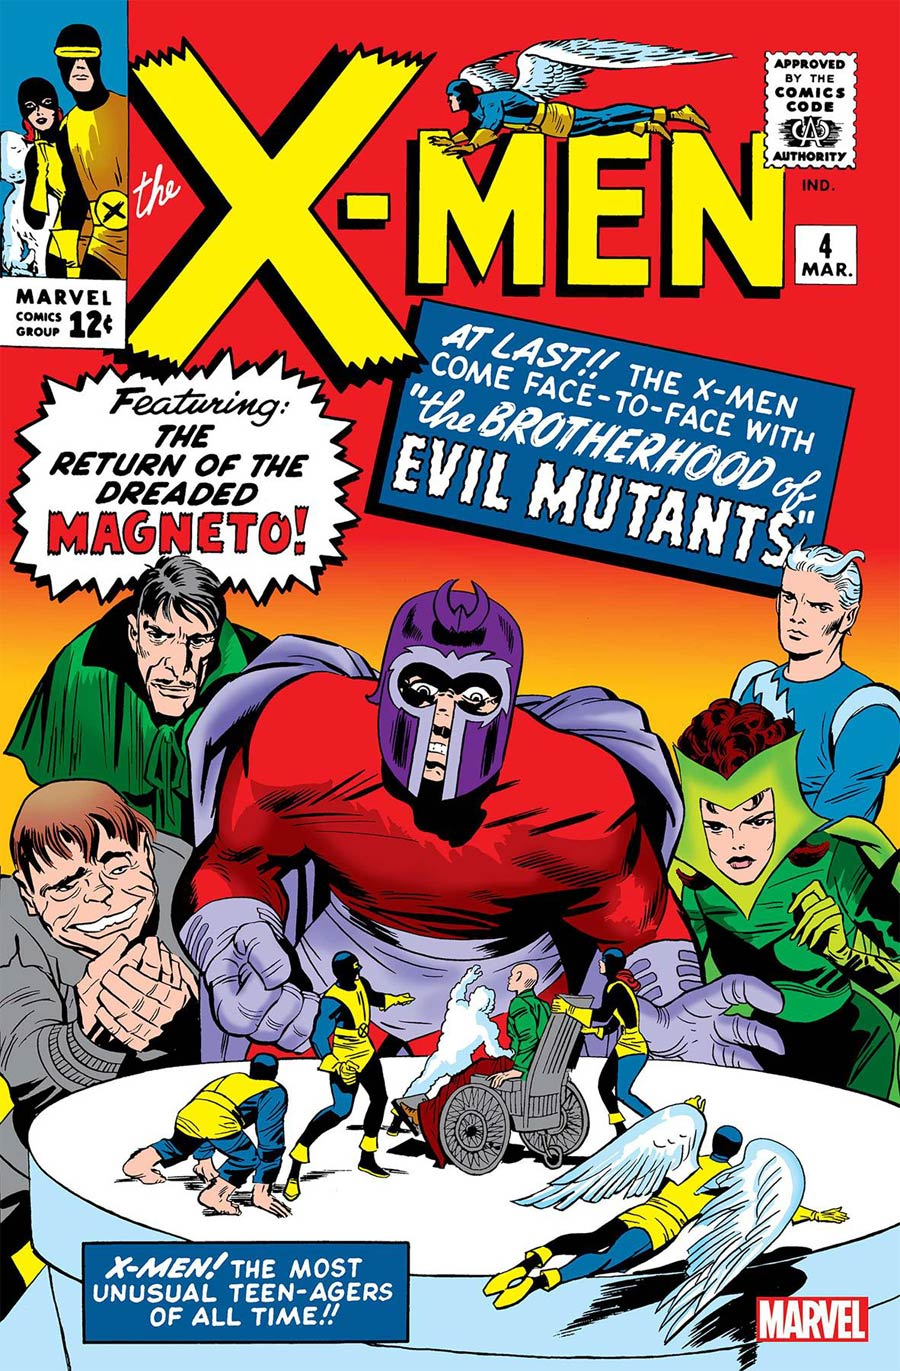 X-Men Vol 1 #4 Cover B Facsimile Edition